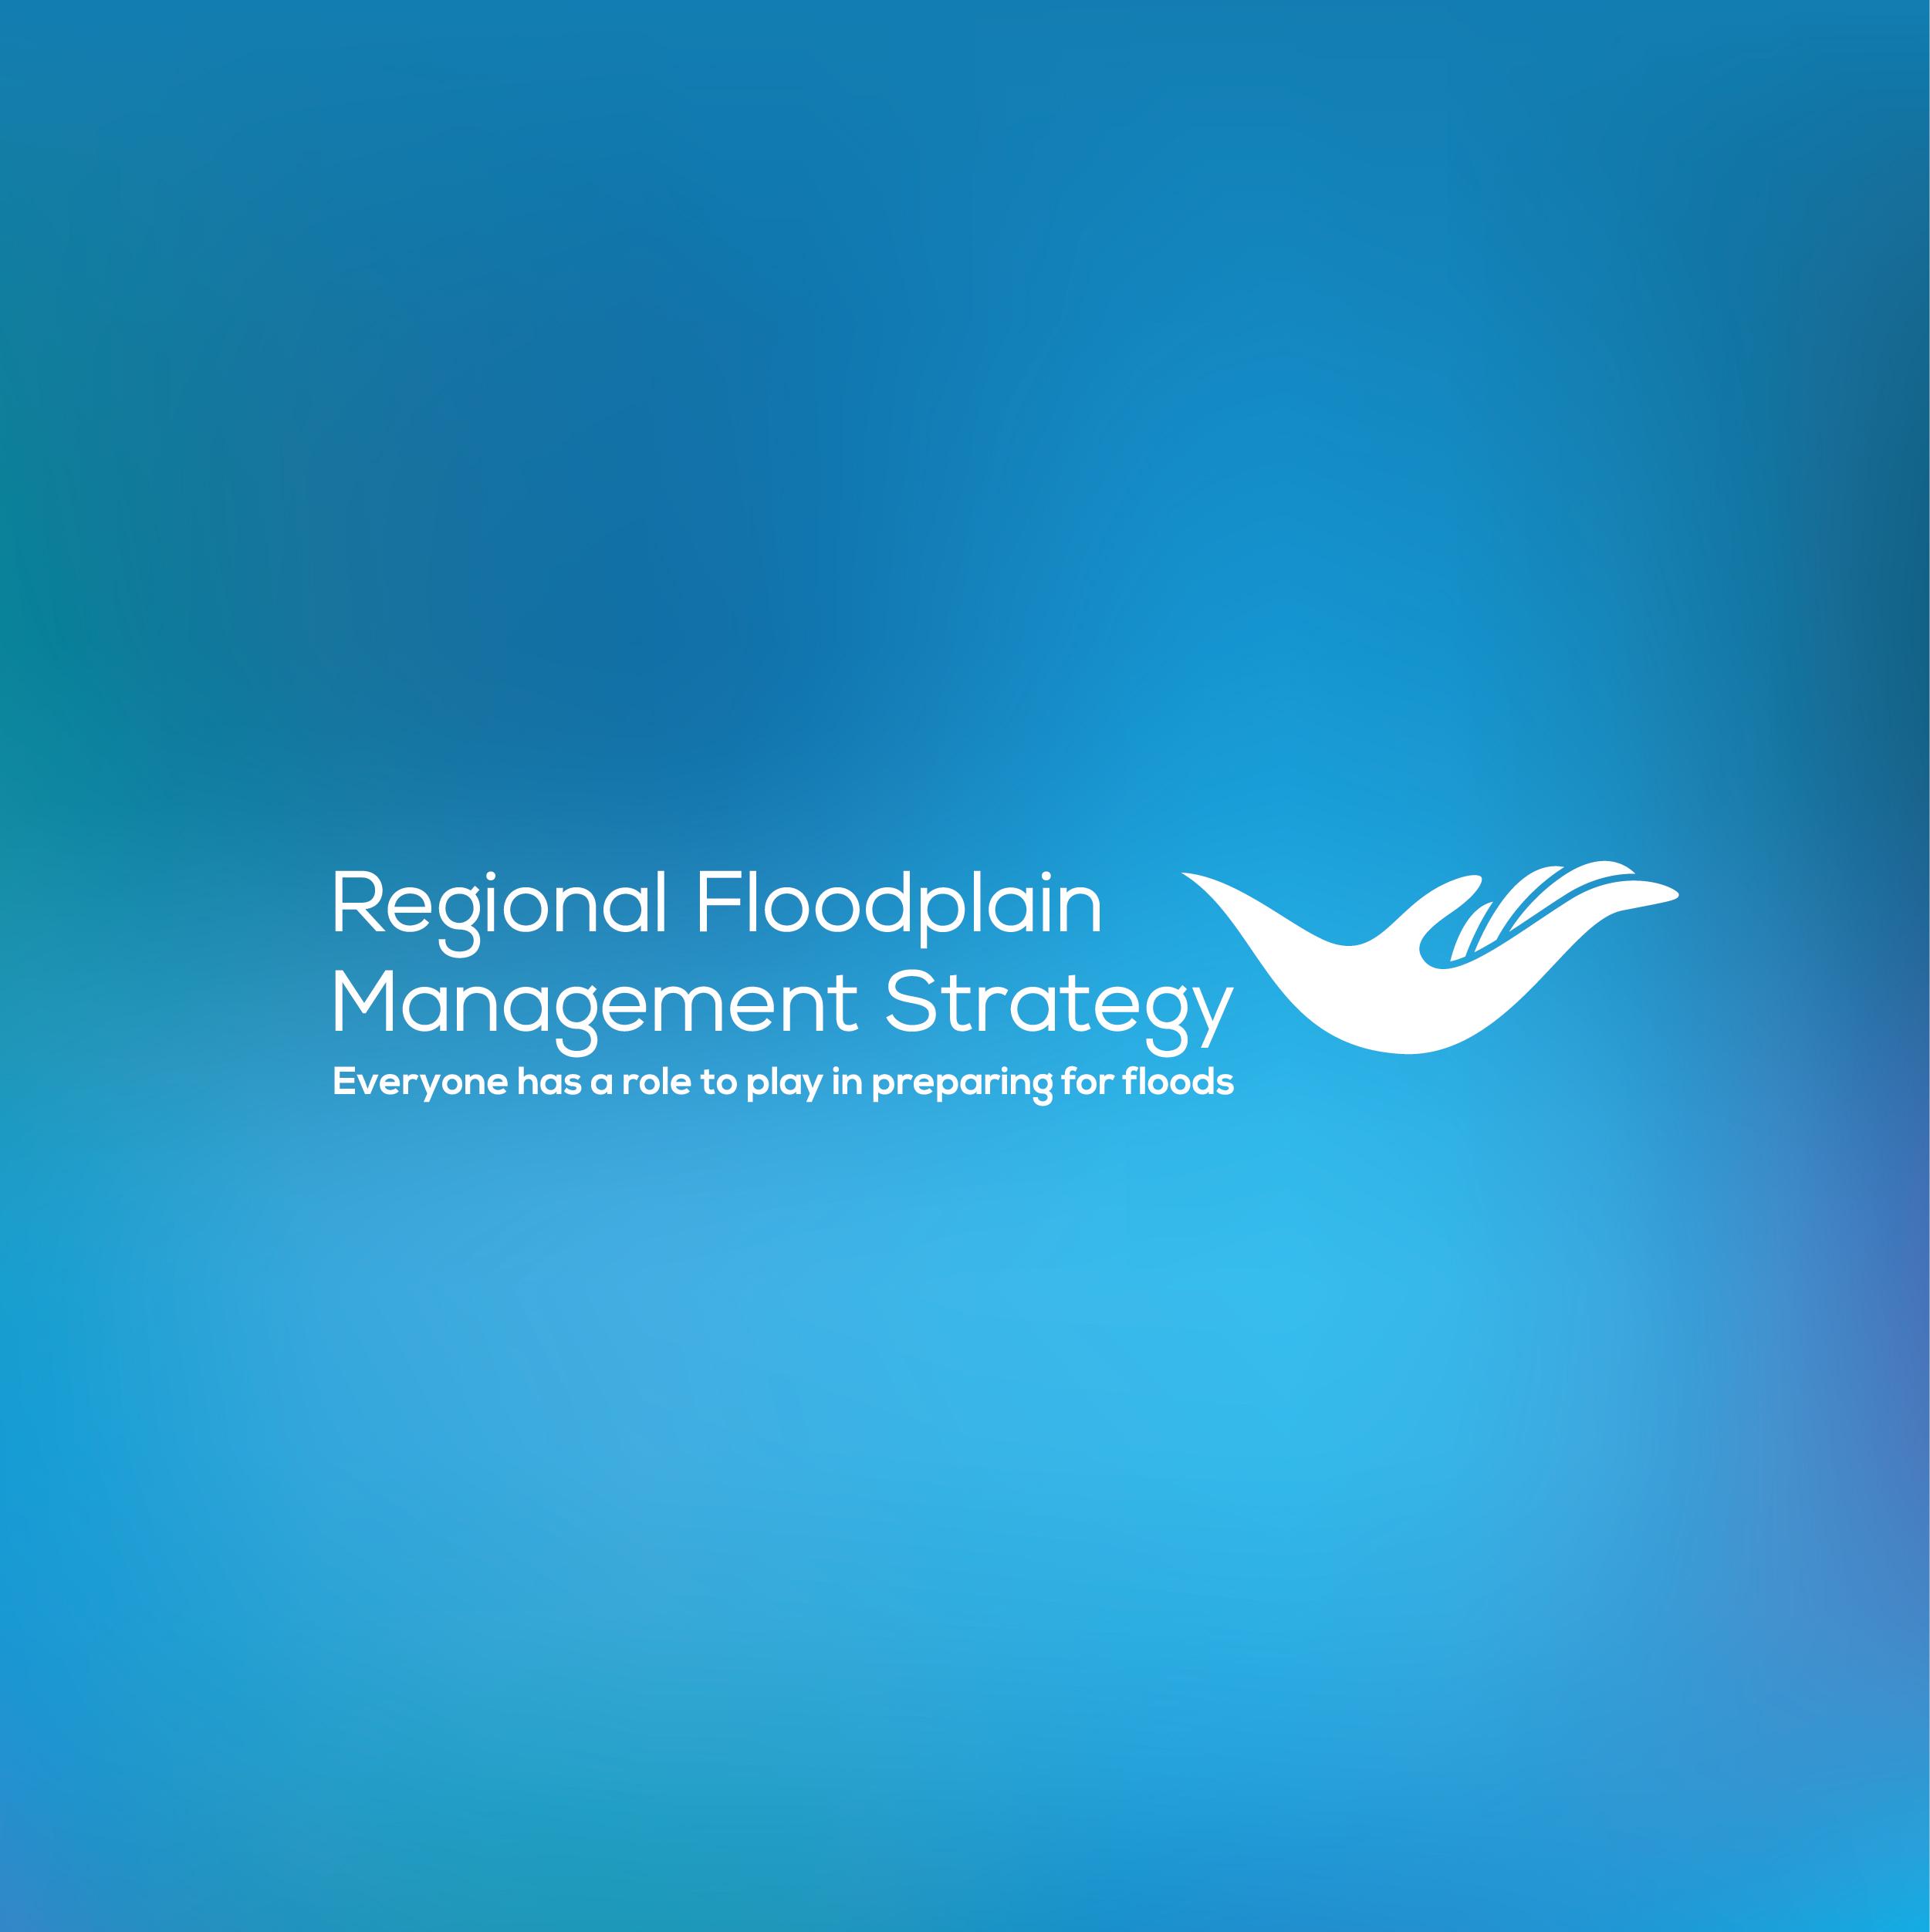 Regional Floodplain Management logo